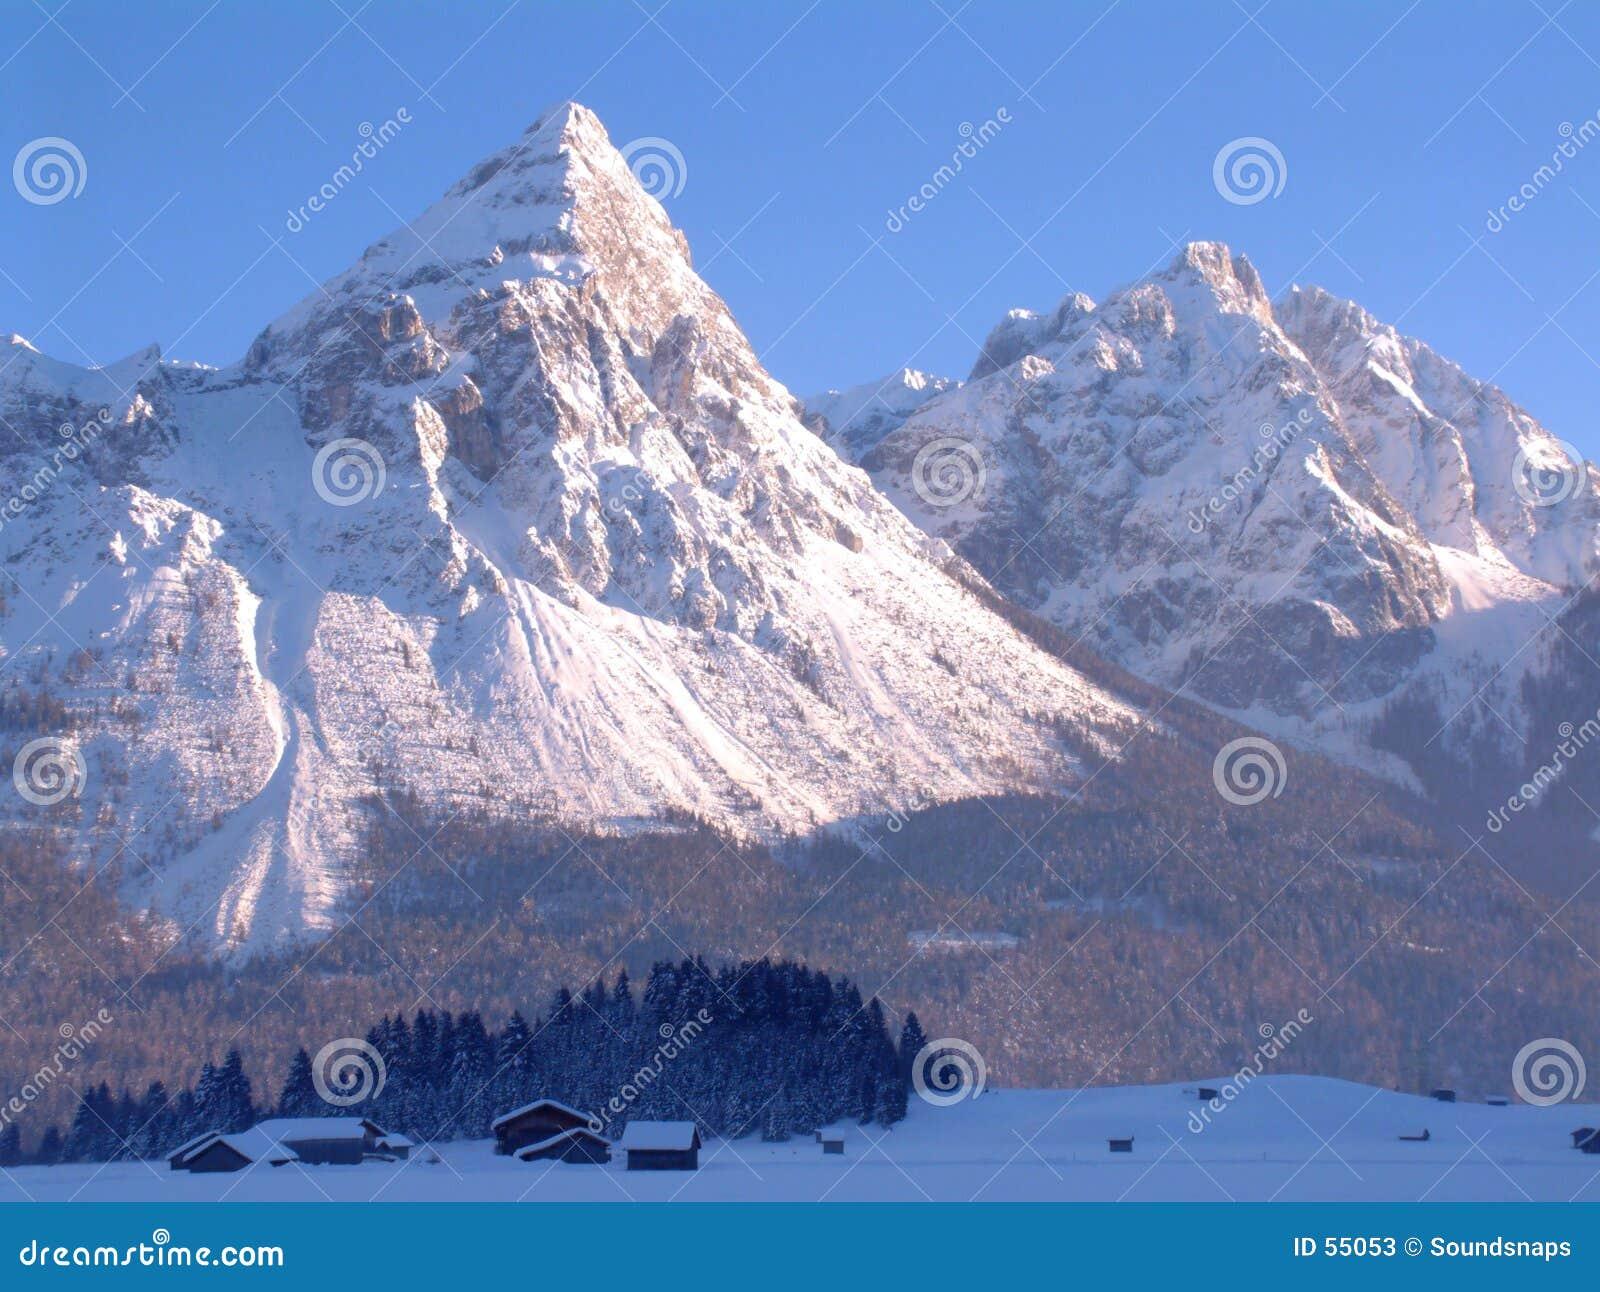 Download το βουνό οξύνει χιονώδη στοκ εικόνα. εικόνα από αιχμηρός - 55053